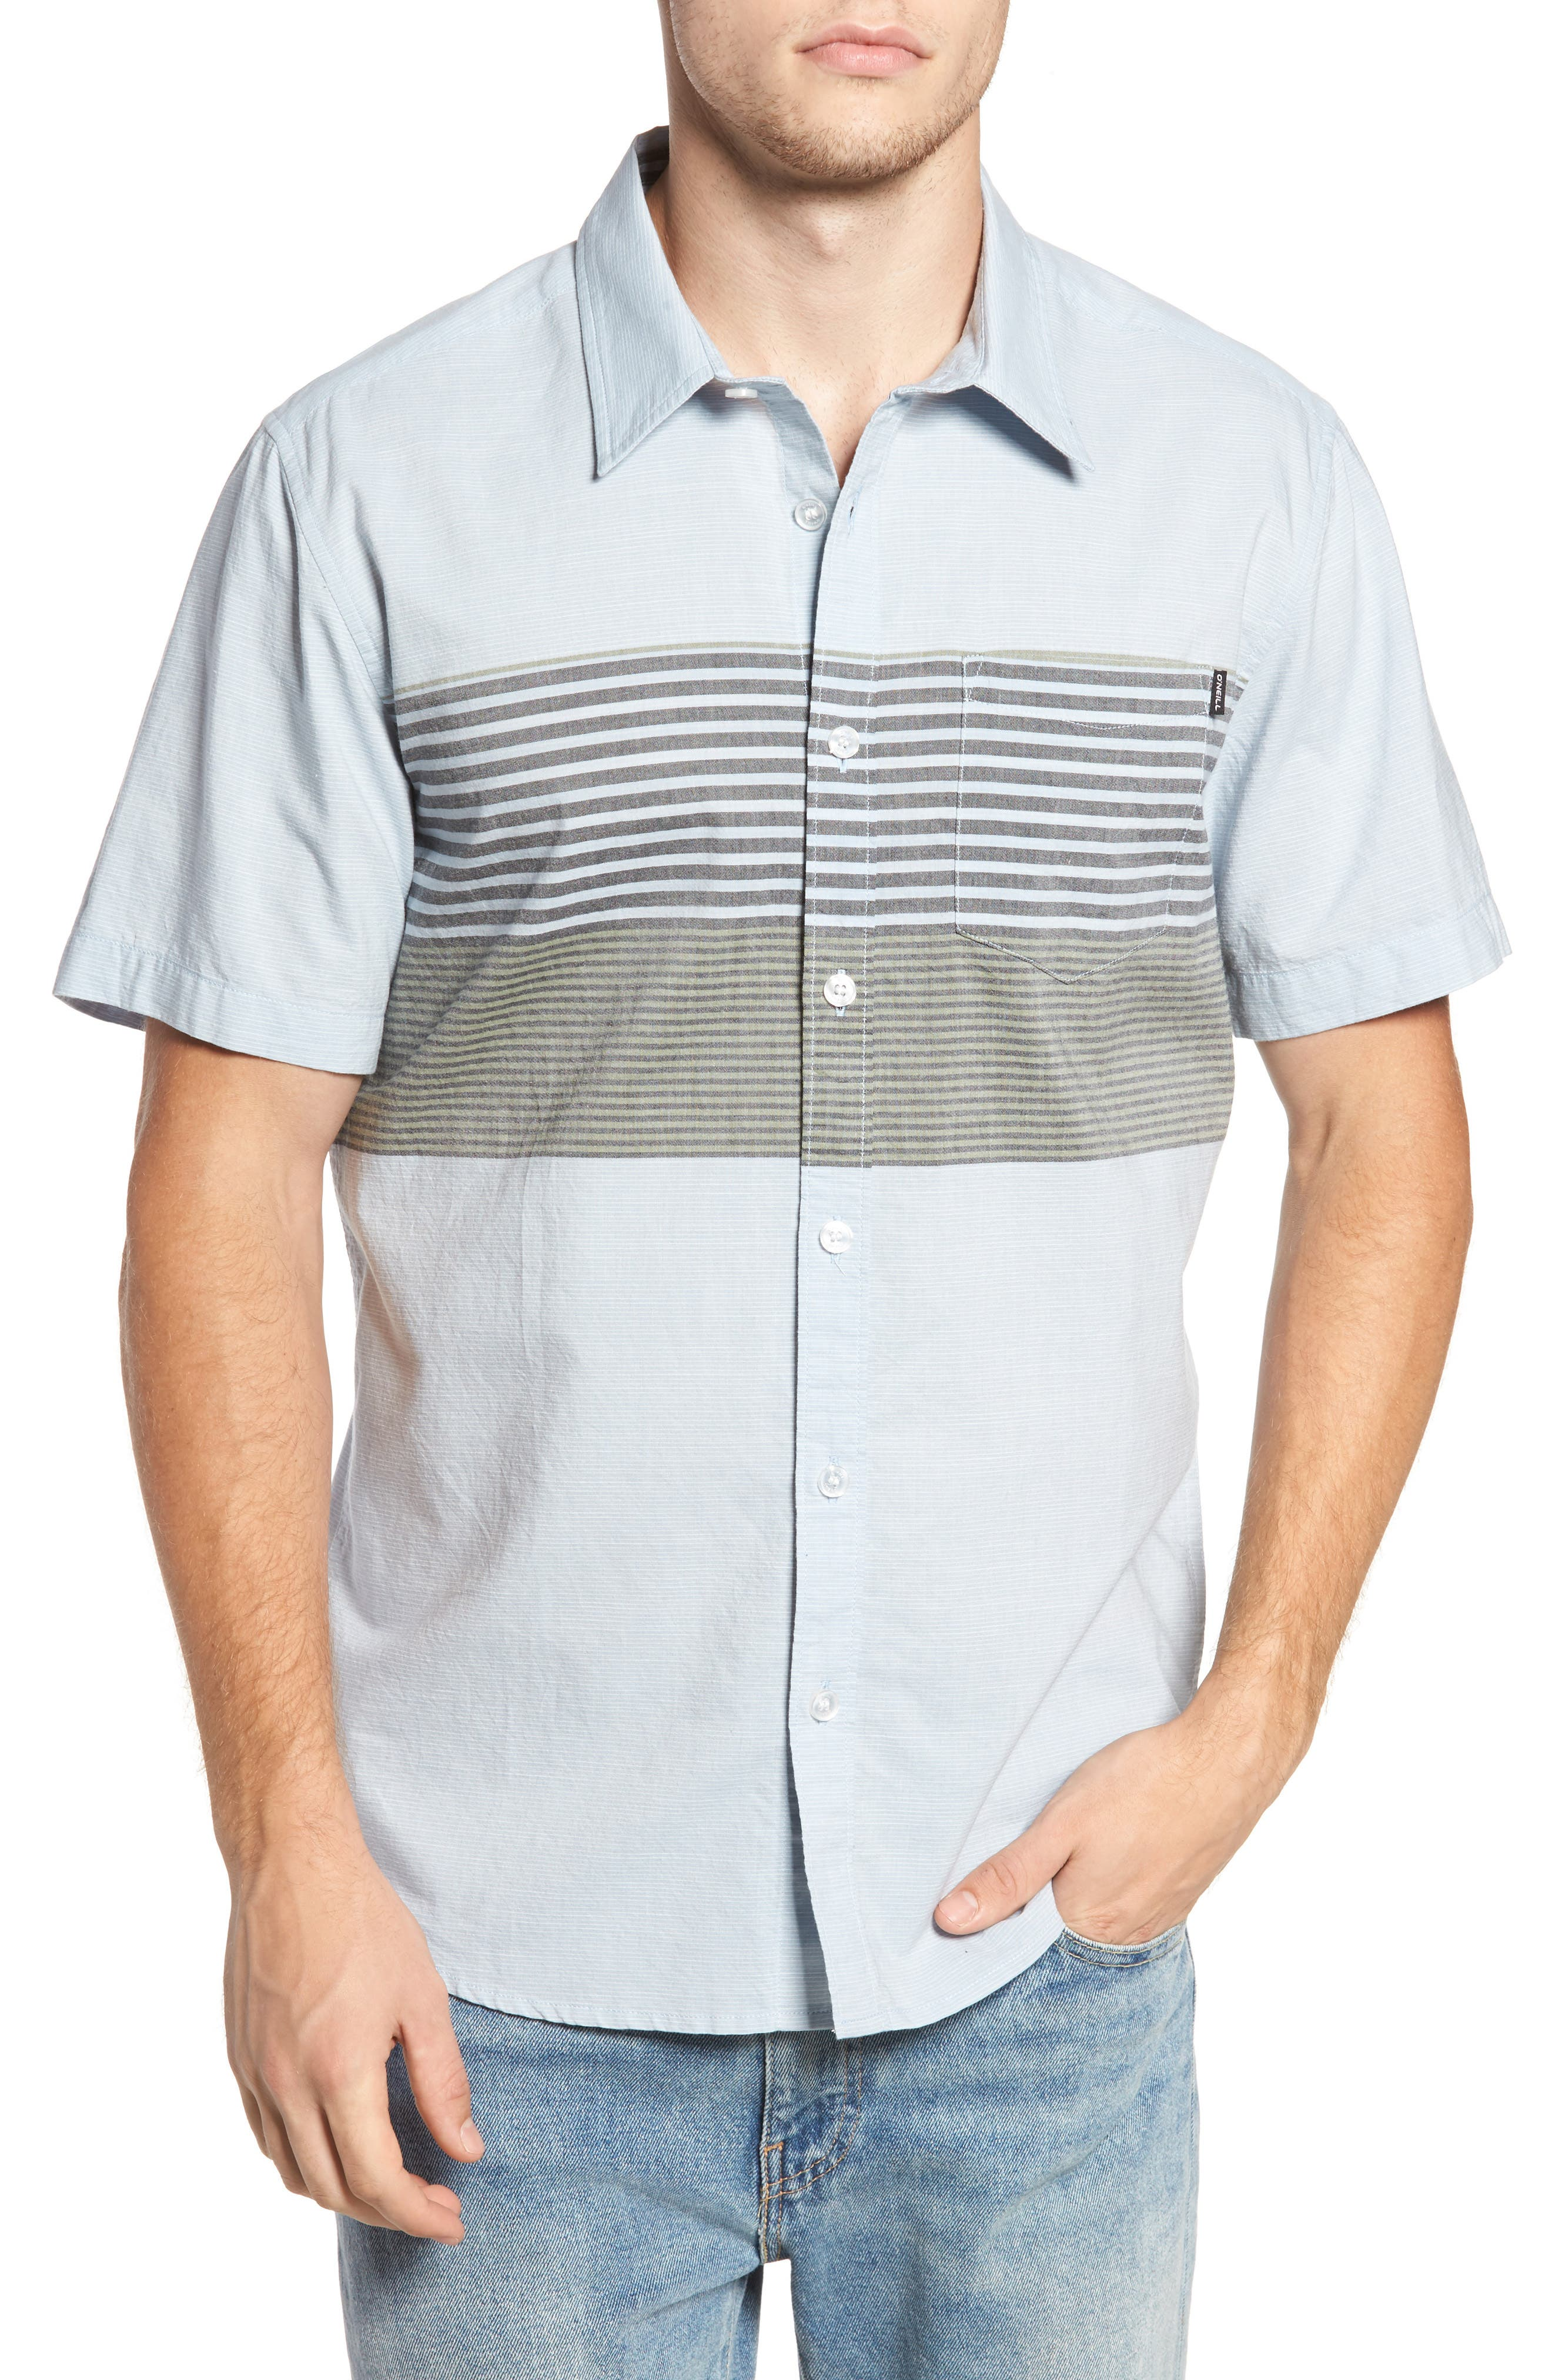 O'Neill Altair Stripe Sport Shirt